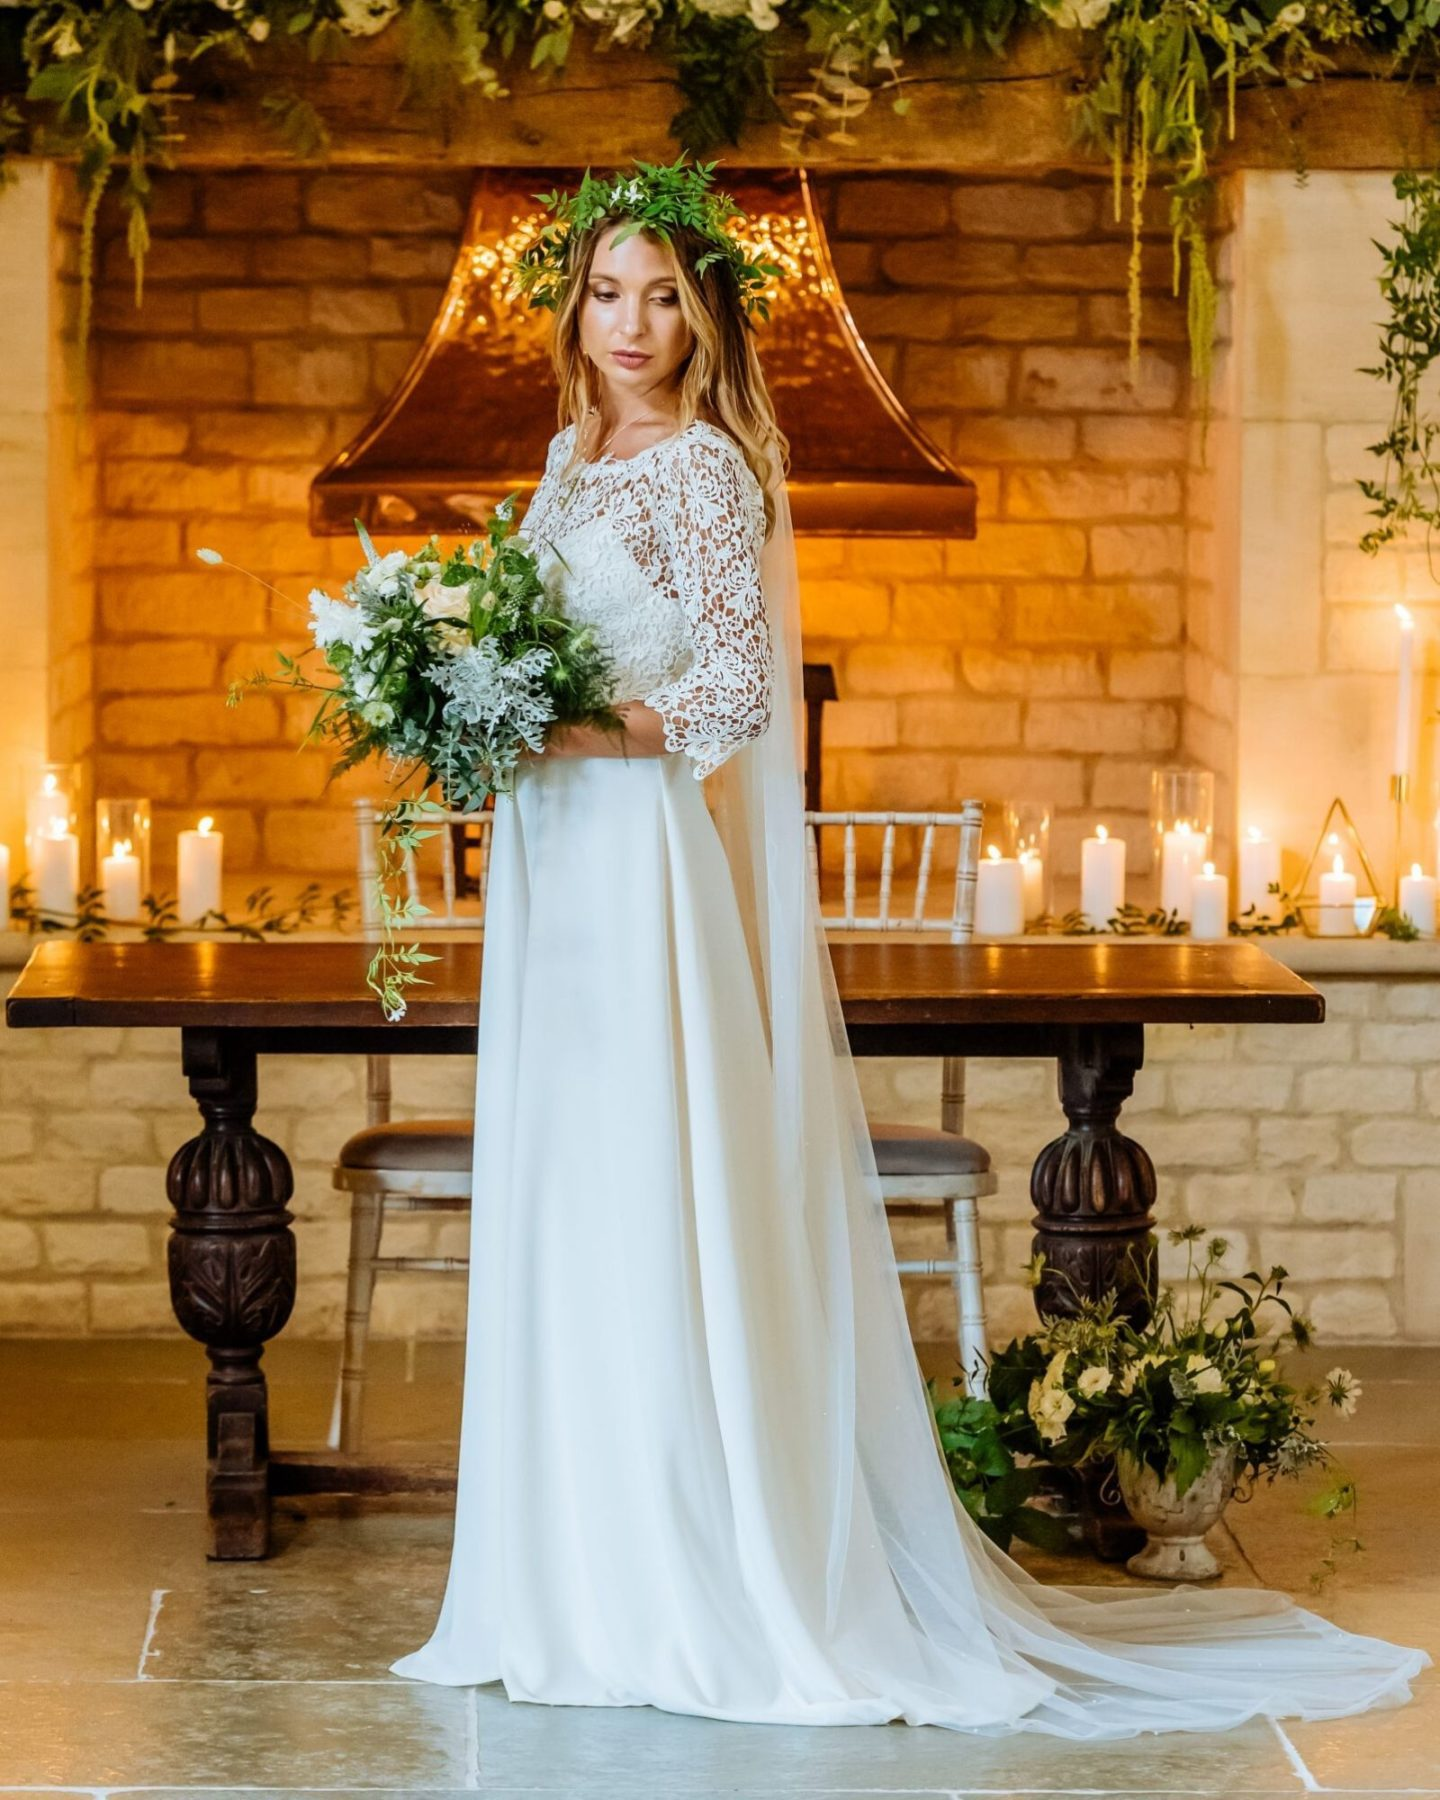 Boho wedding dress by Boho Bride Freedom Collection